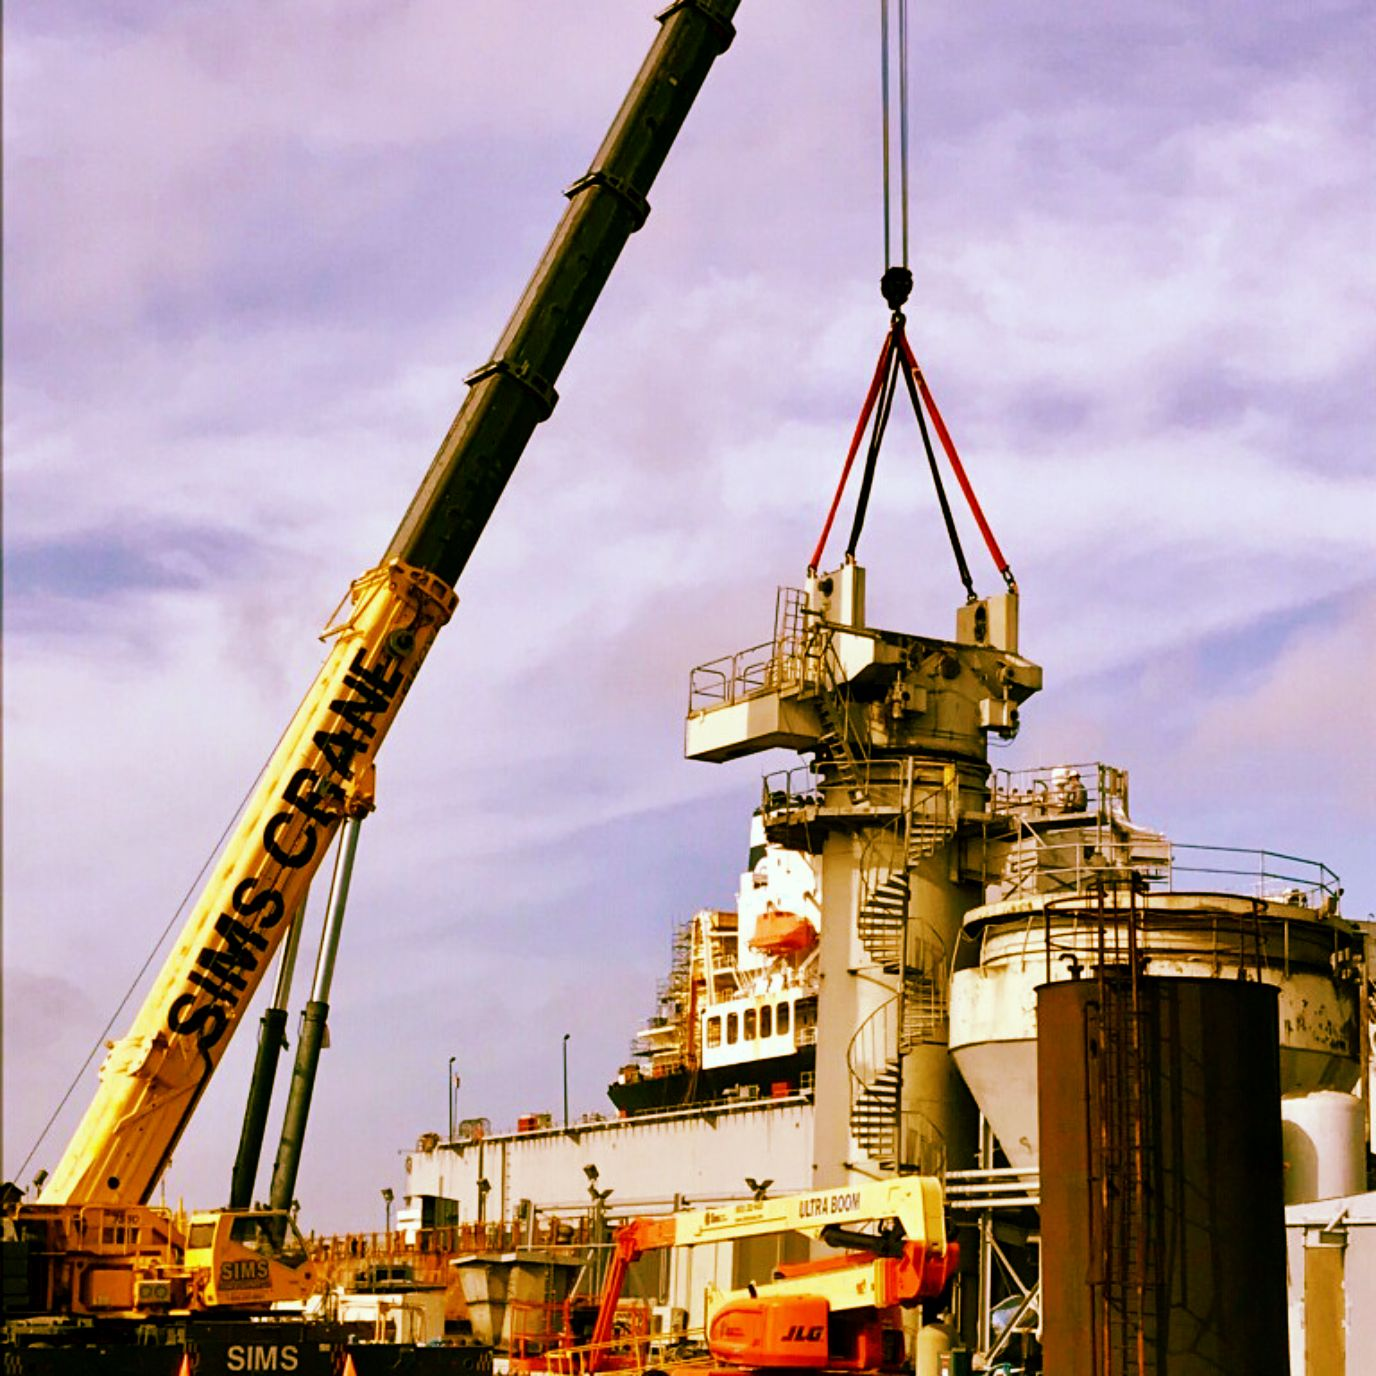 Sims Crane & Equipment Co. image 5